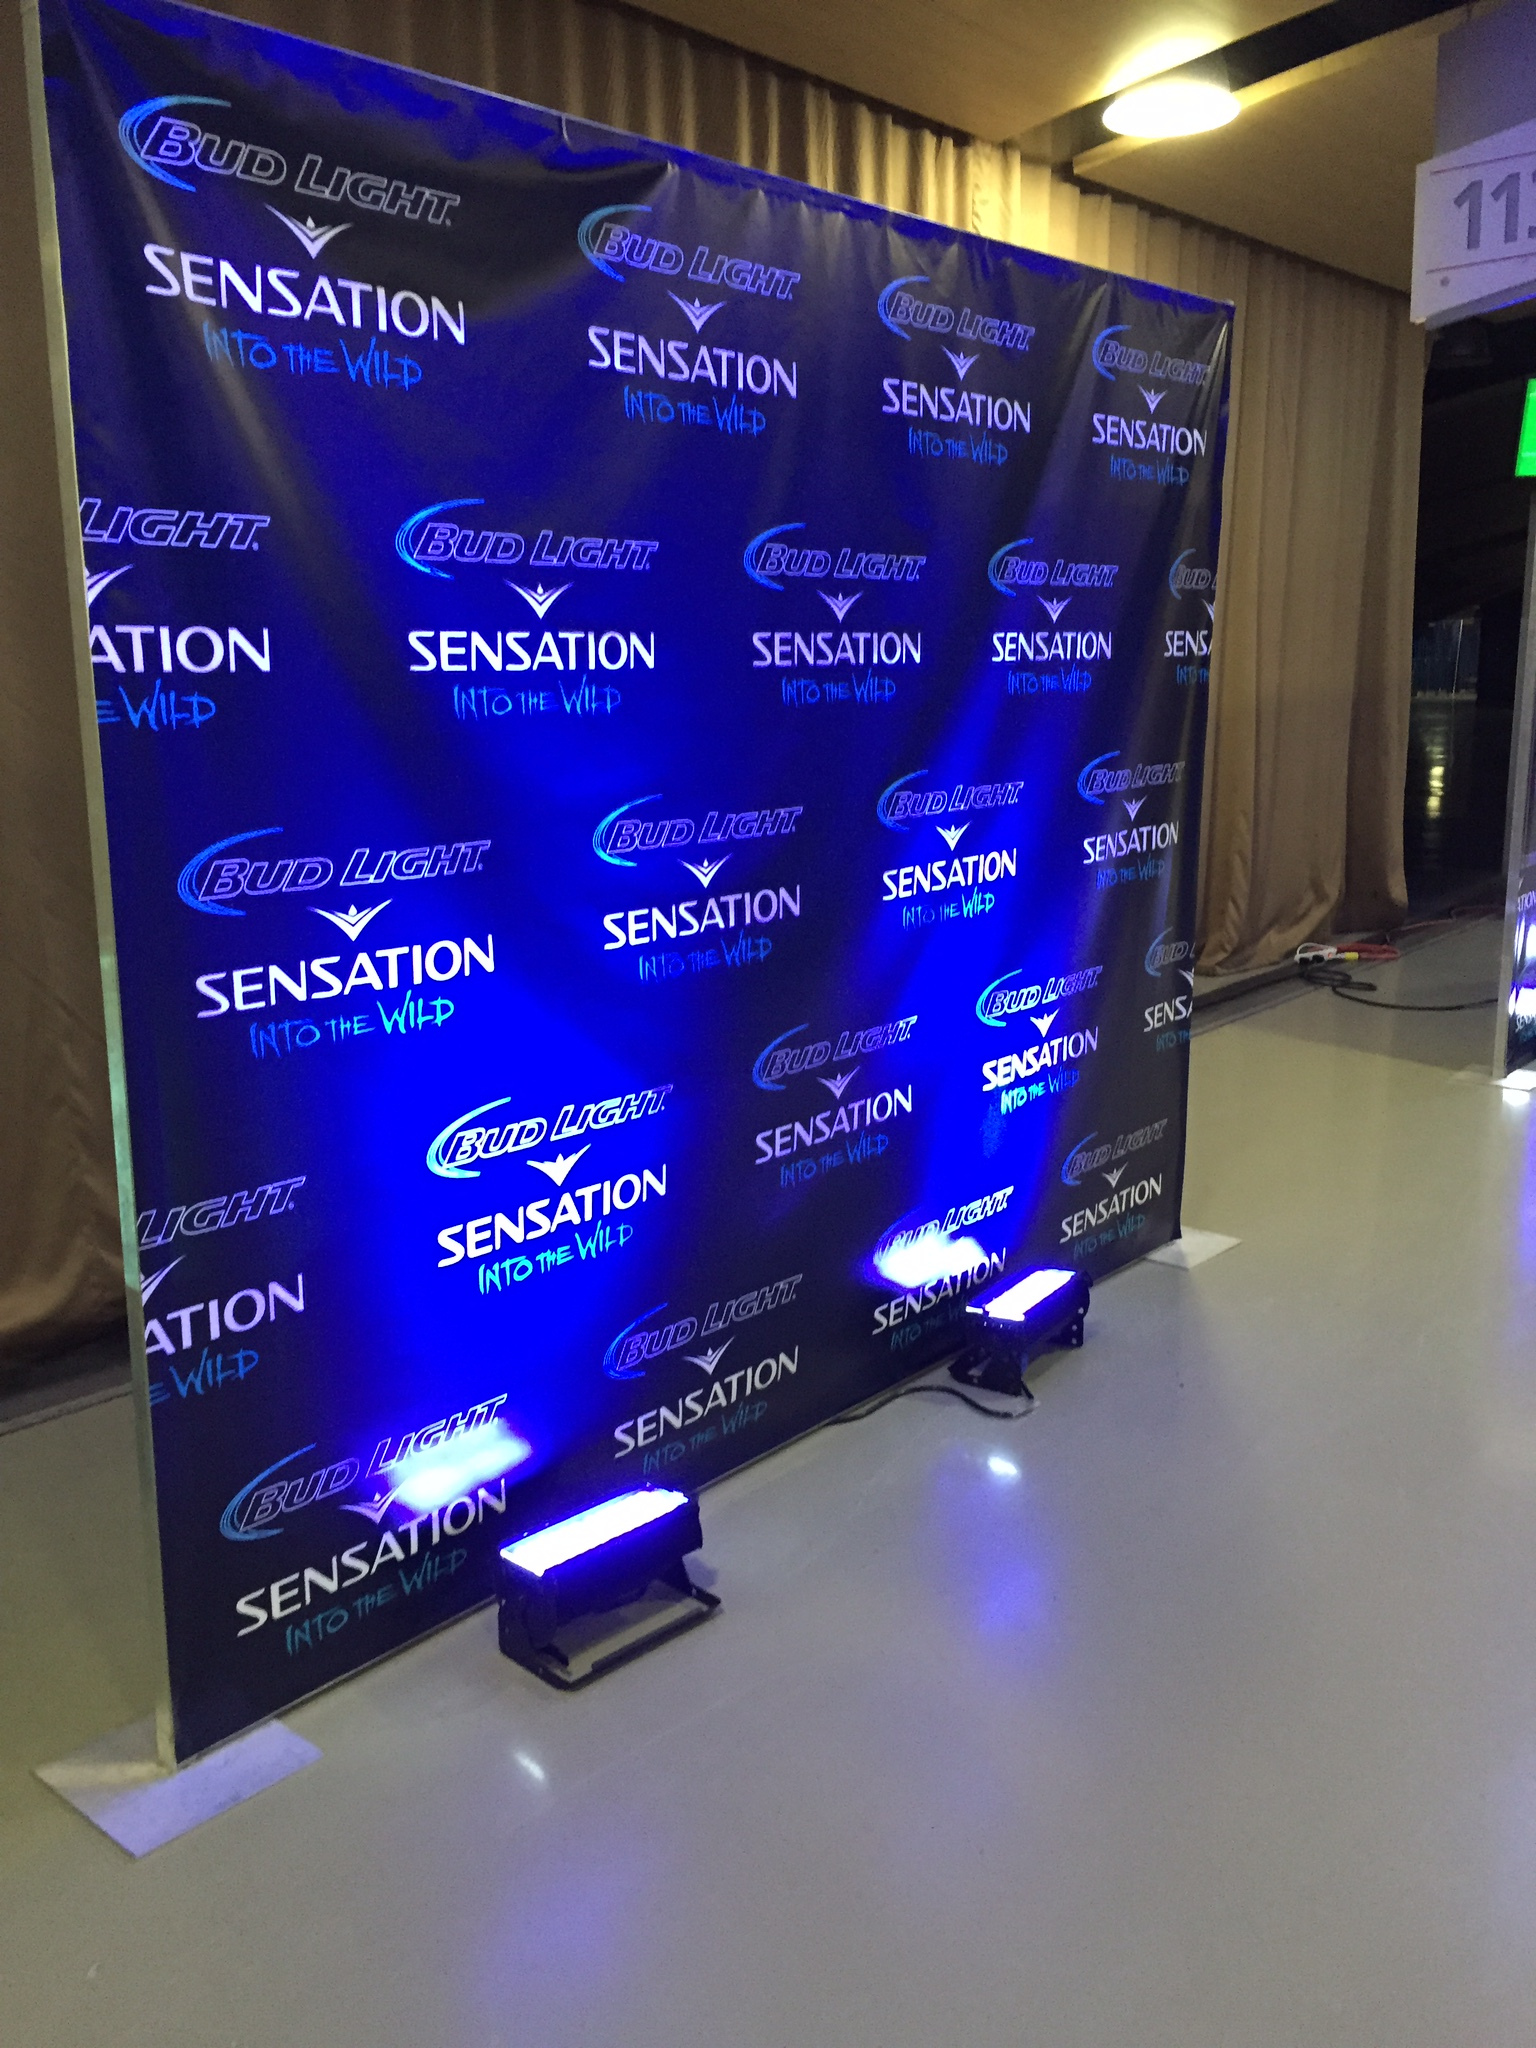 10'x8' backdrop - Bud Light Sensation: Into the Wild 2014